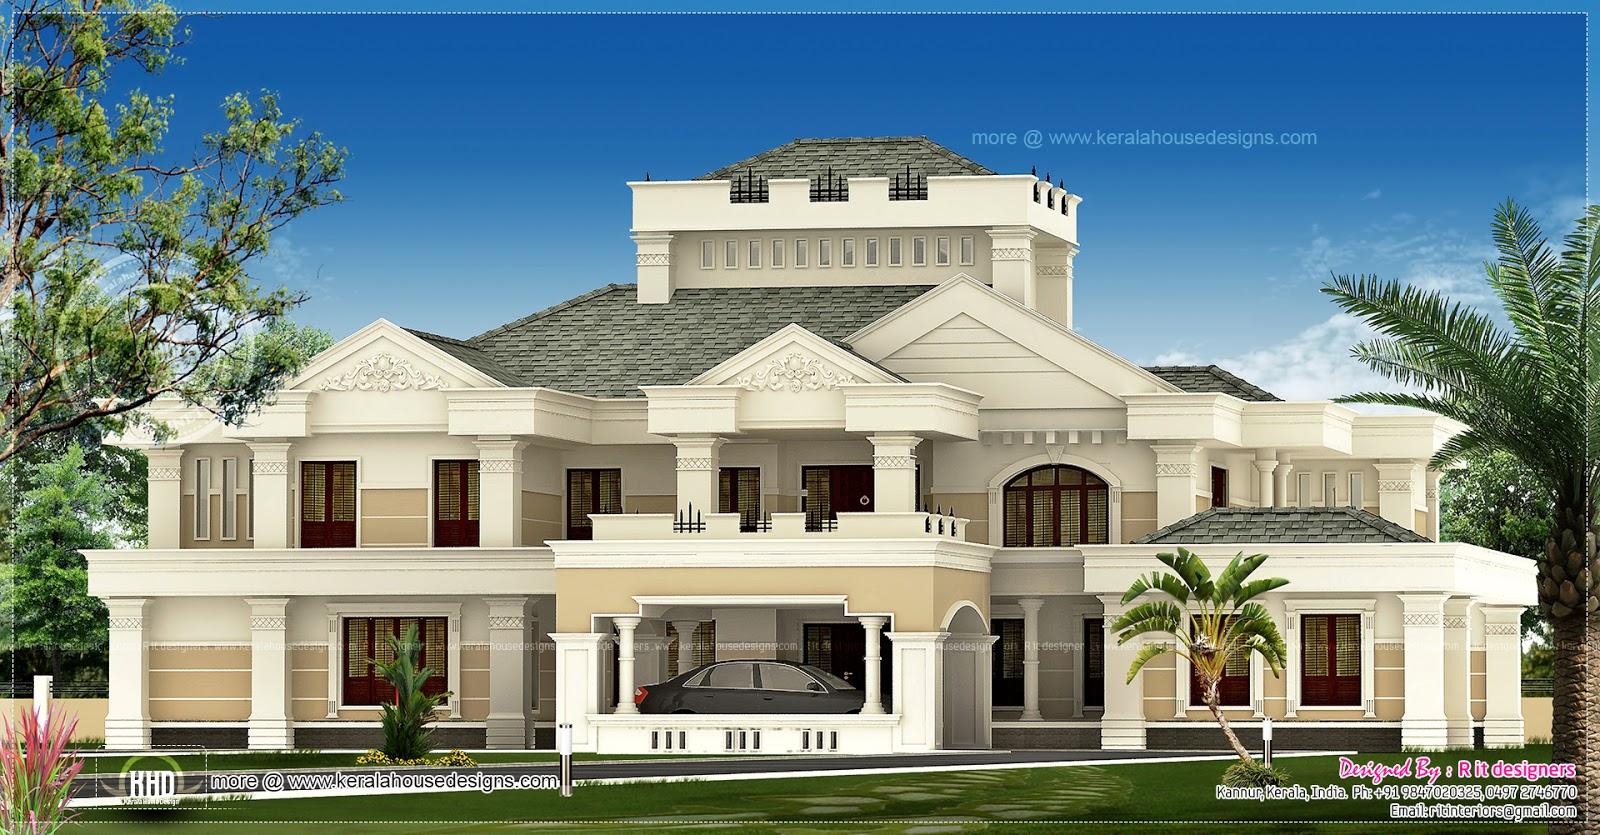 luxury kerala house exterior kerala home design floor plans luxury house plans luxury house plans luxury house